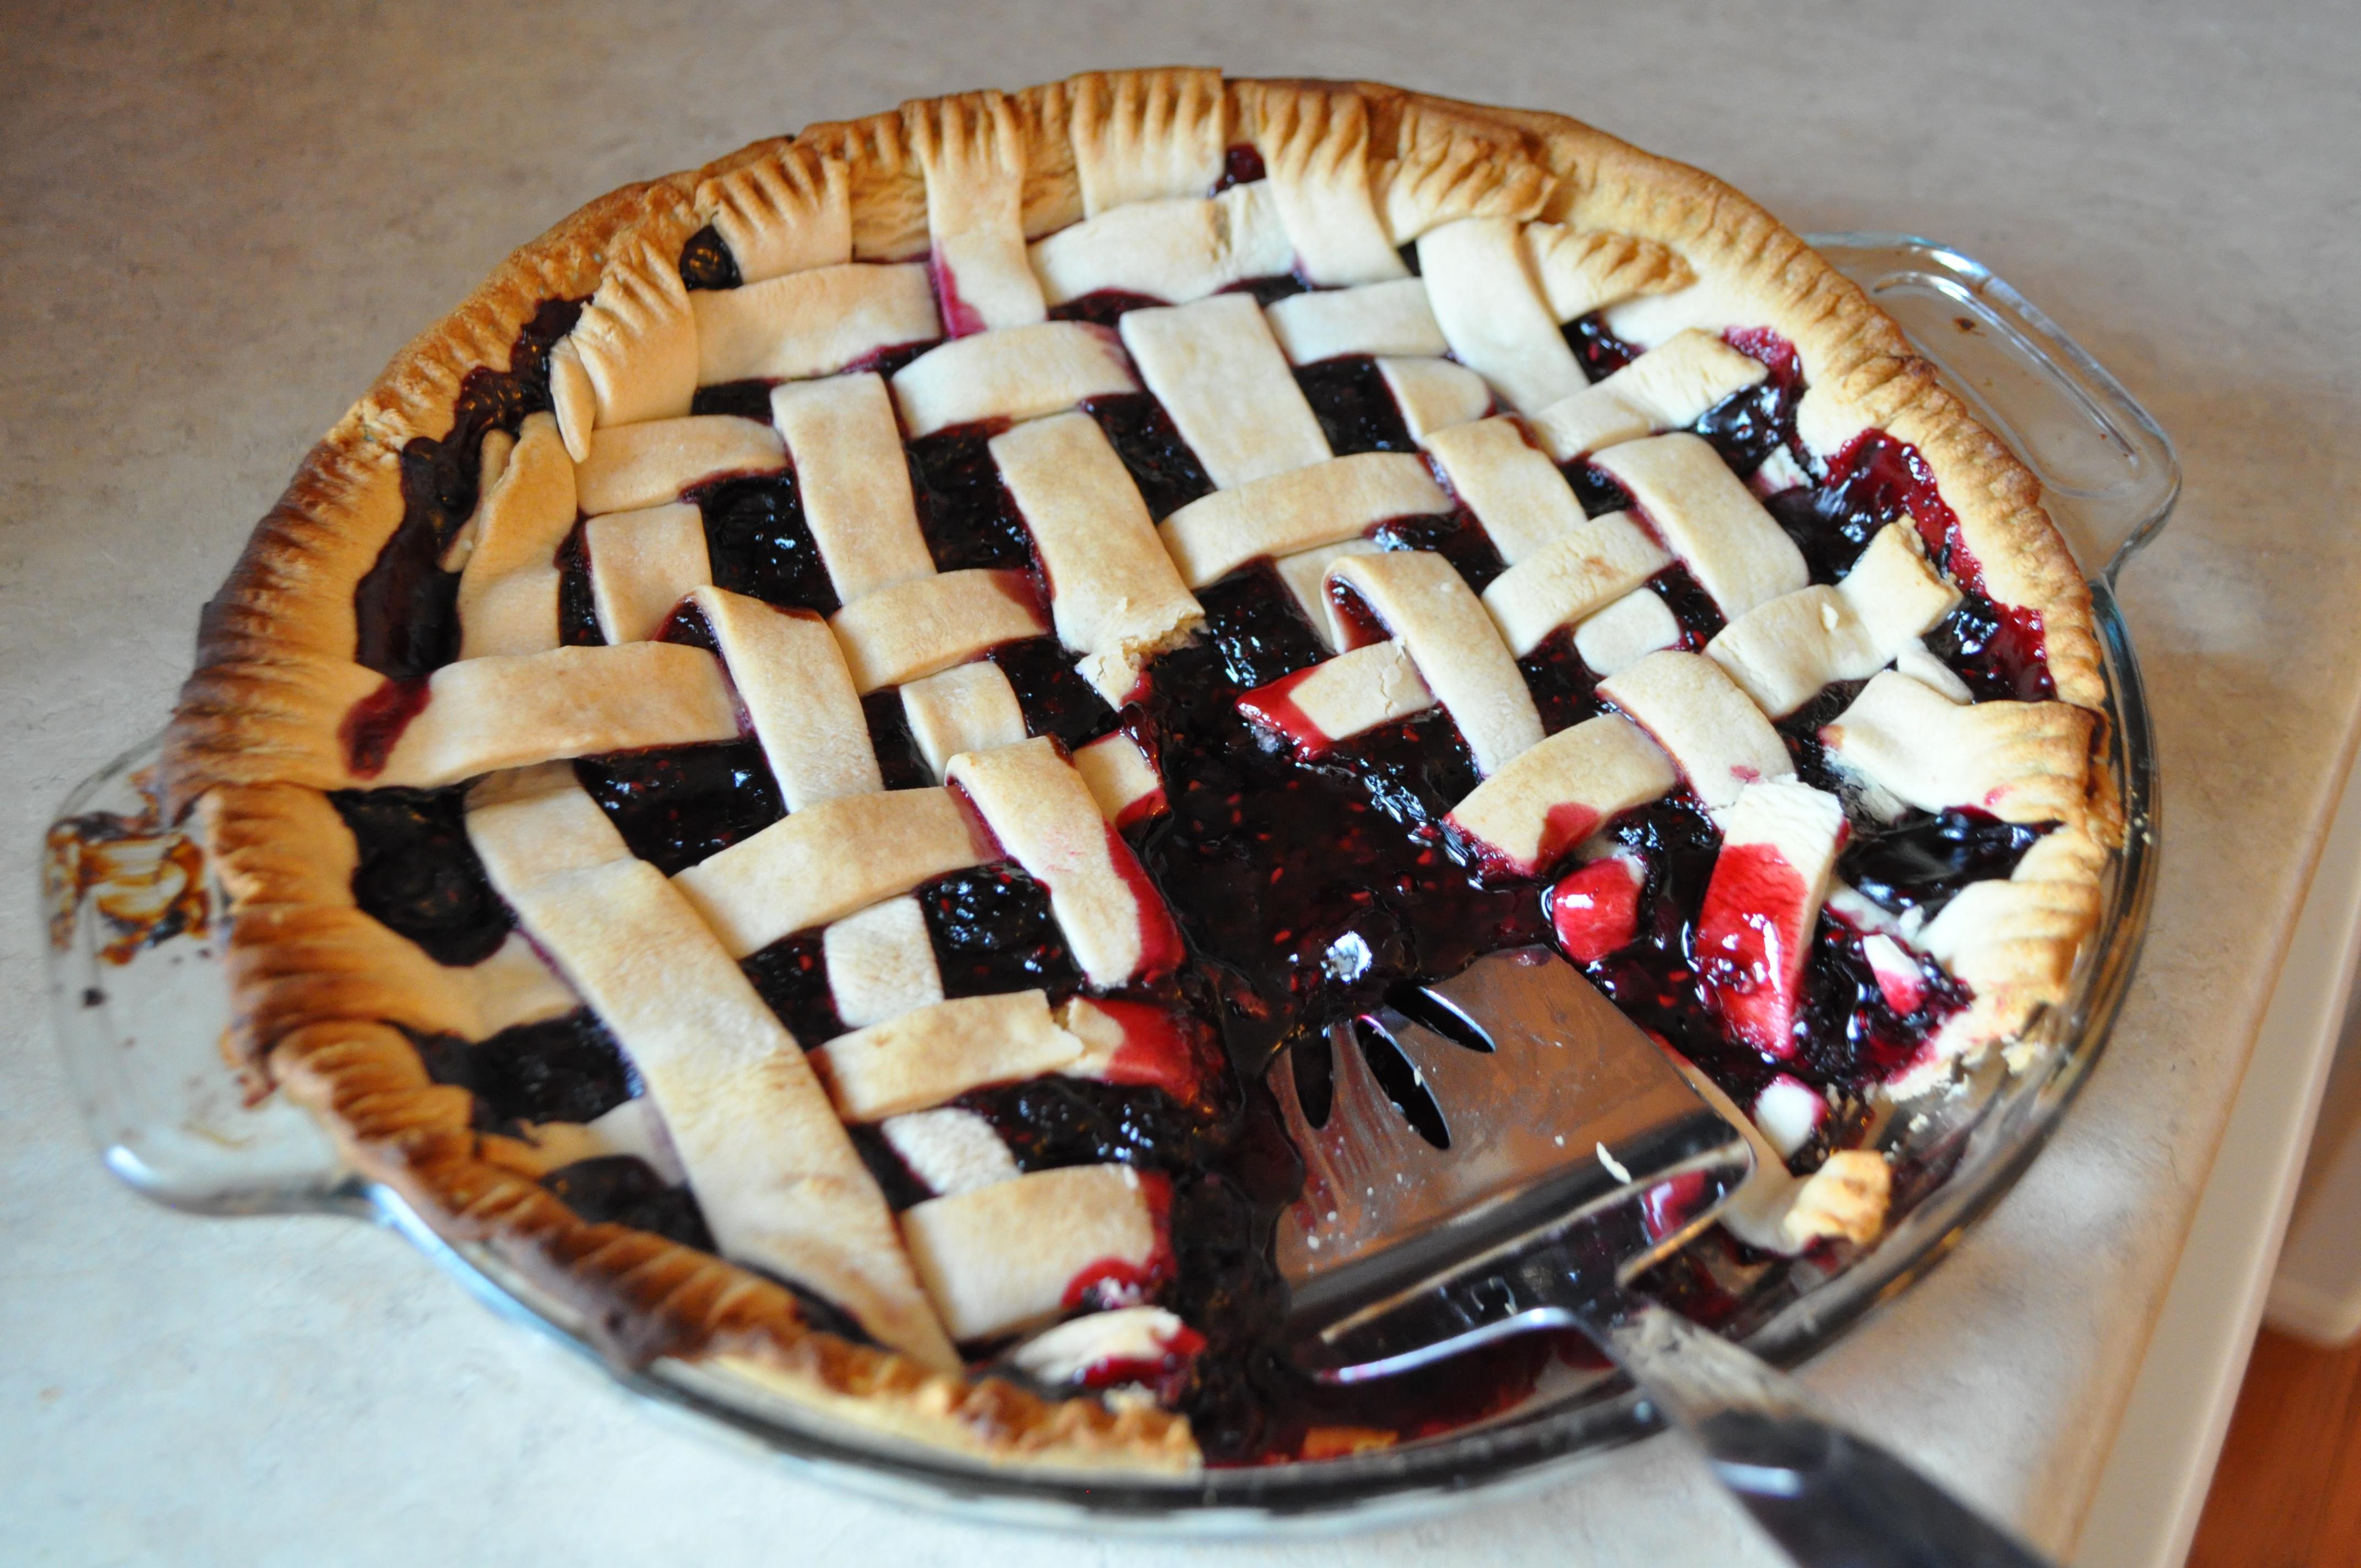 Berry Medley Pie